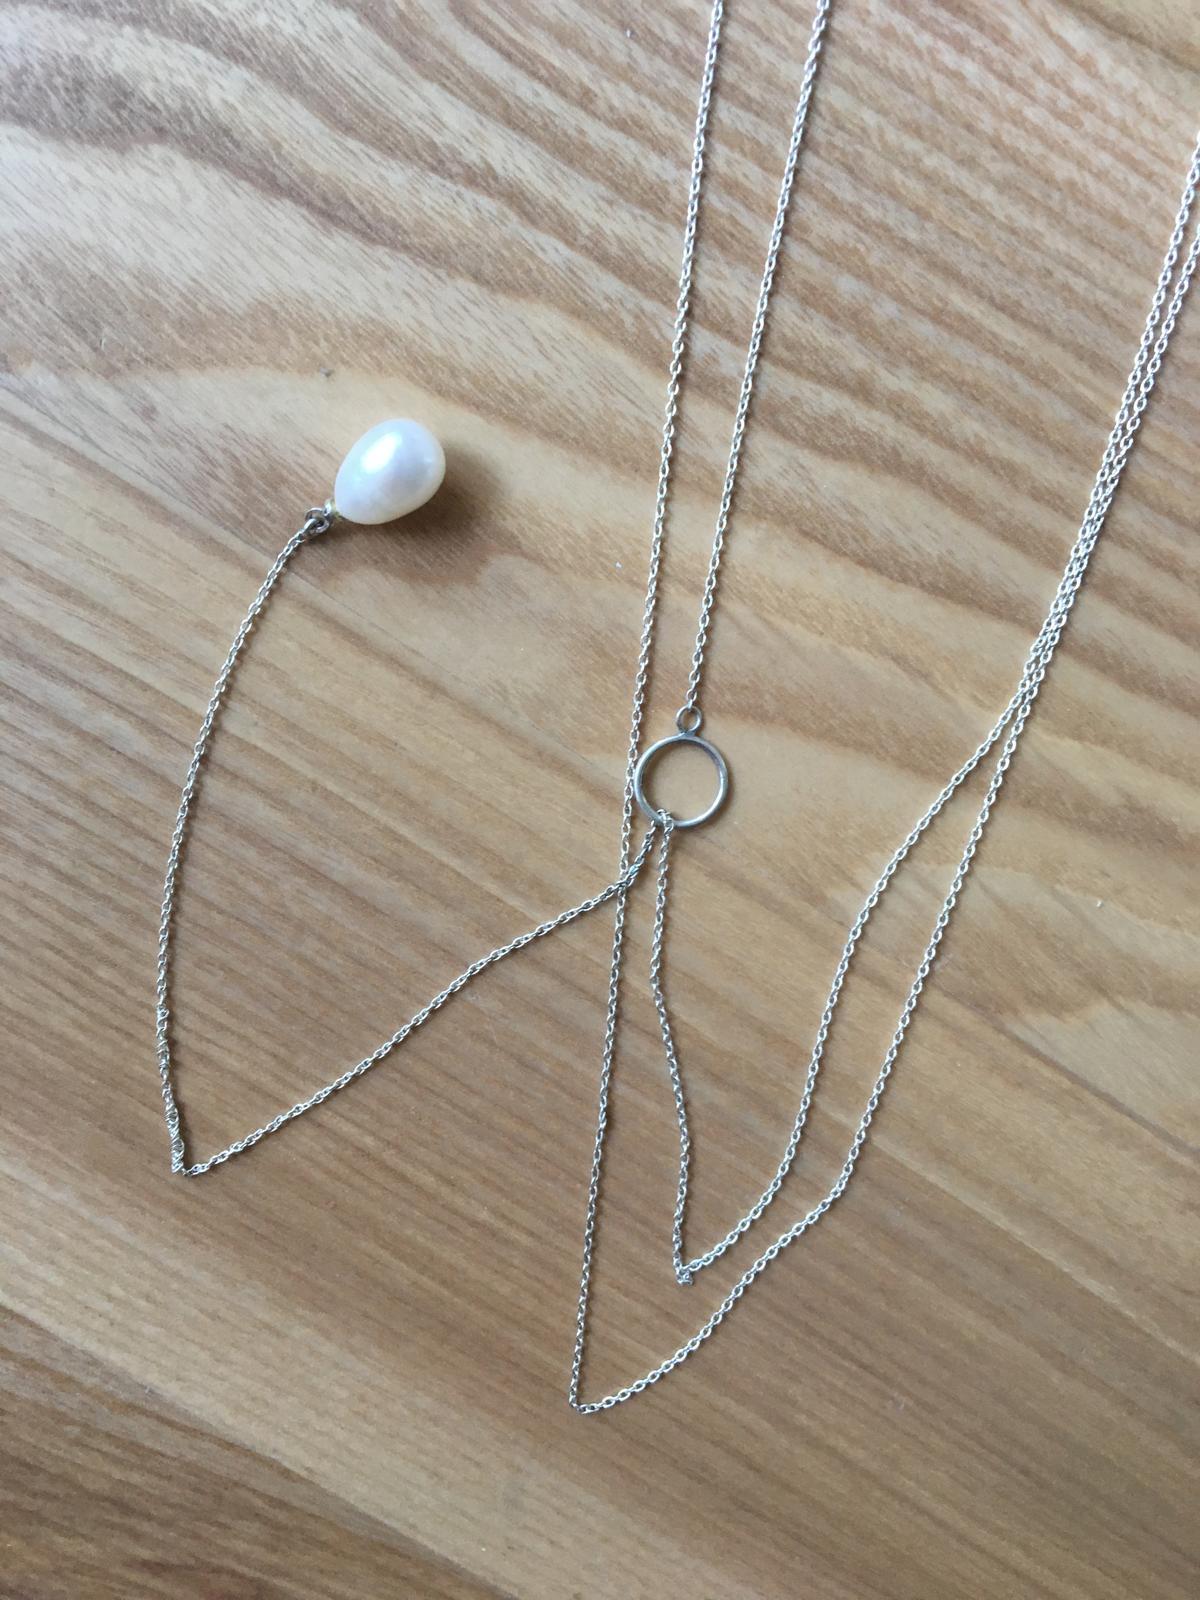 Stribrny body chain s pearl drop na zadech - Obrázek č. 1